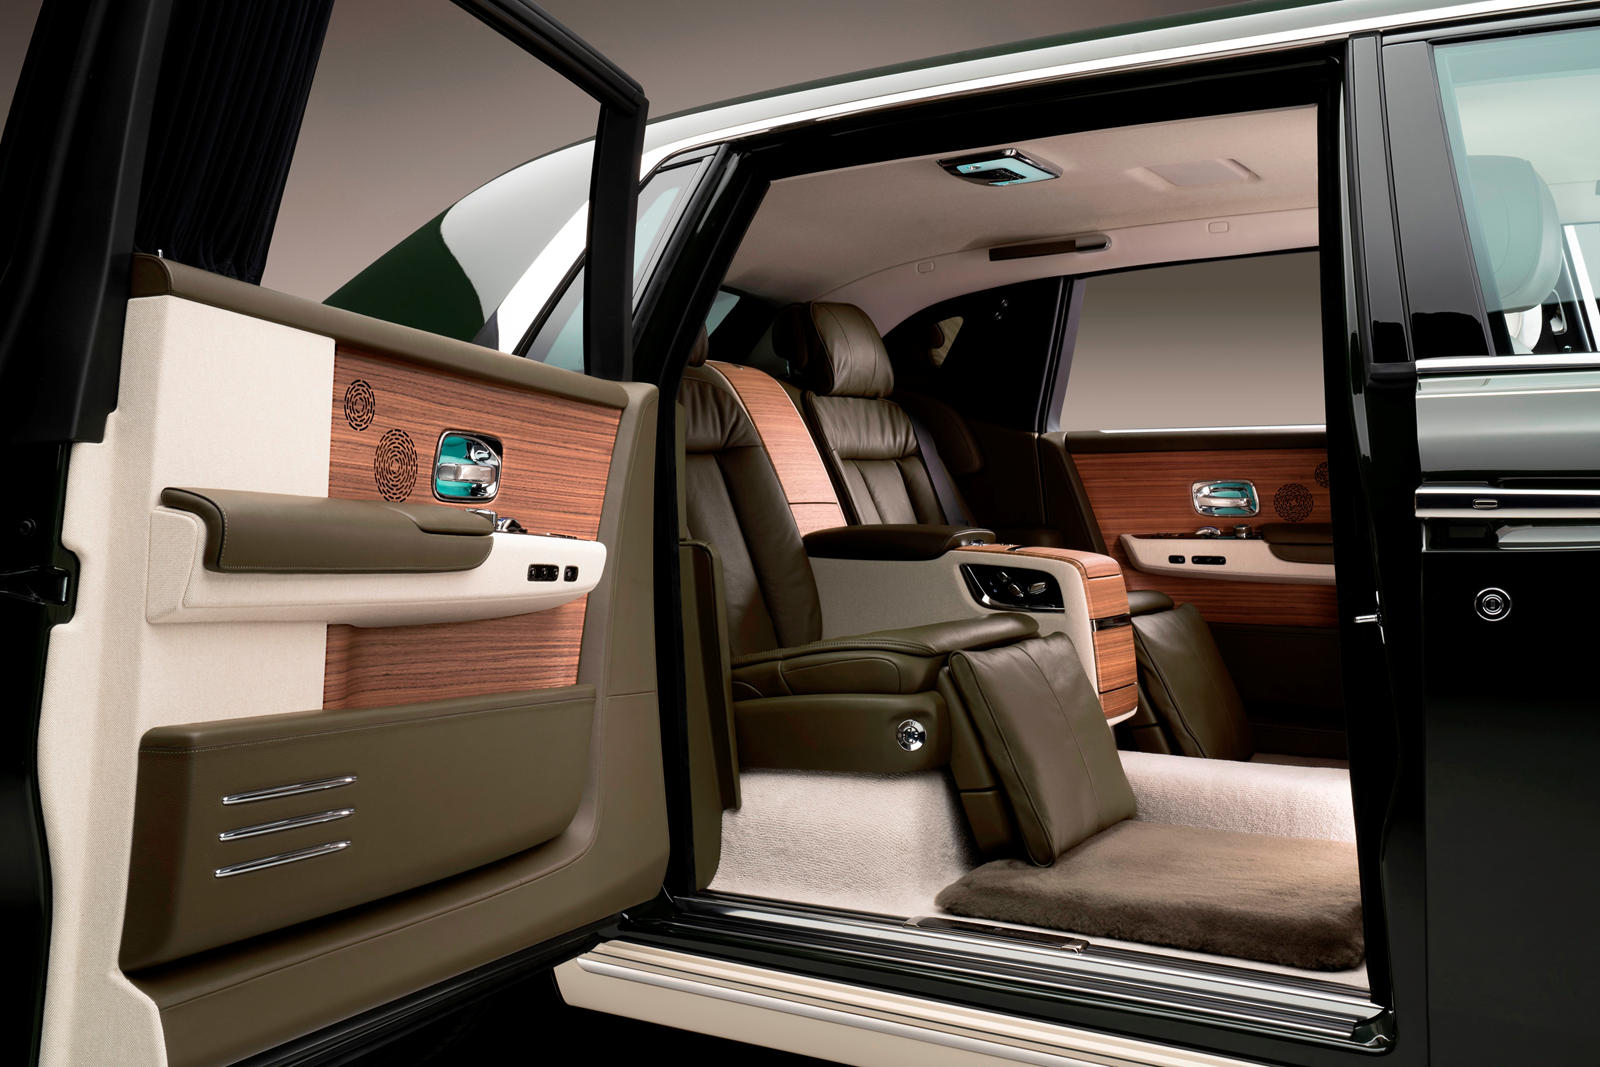 The Hermès Phantom Oribe interior. Photo via Rolls Royce.